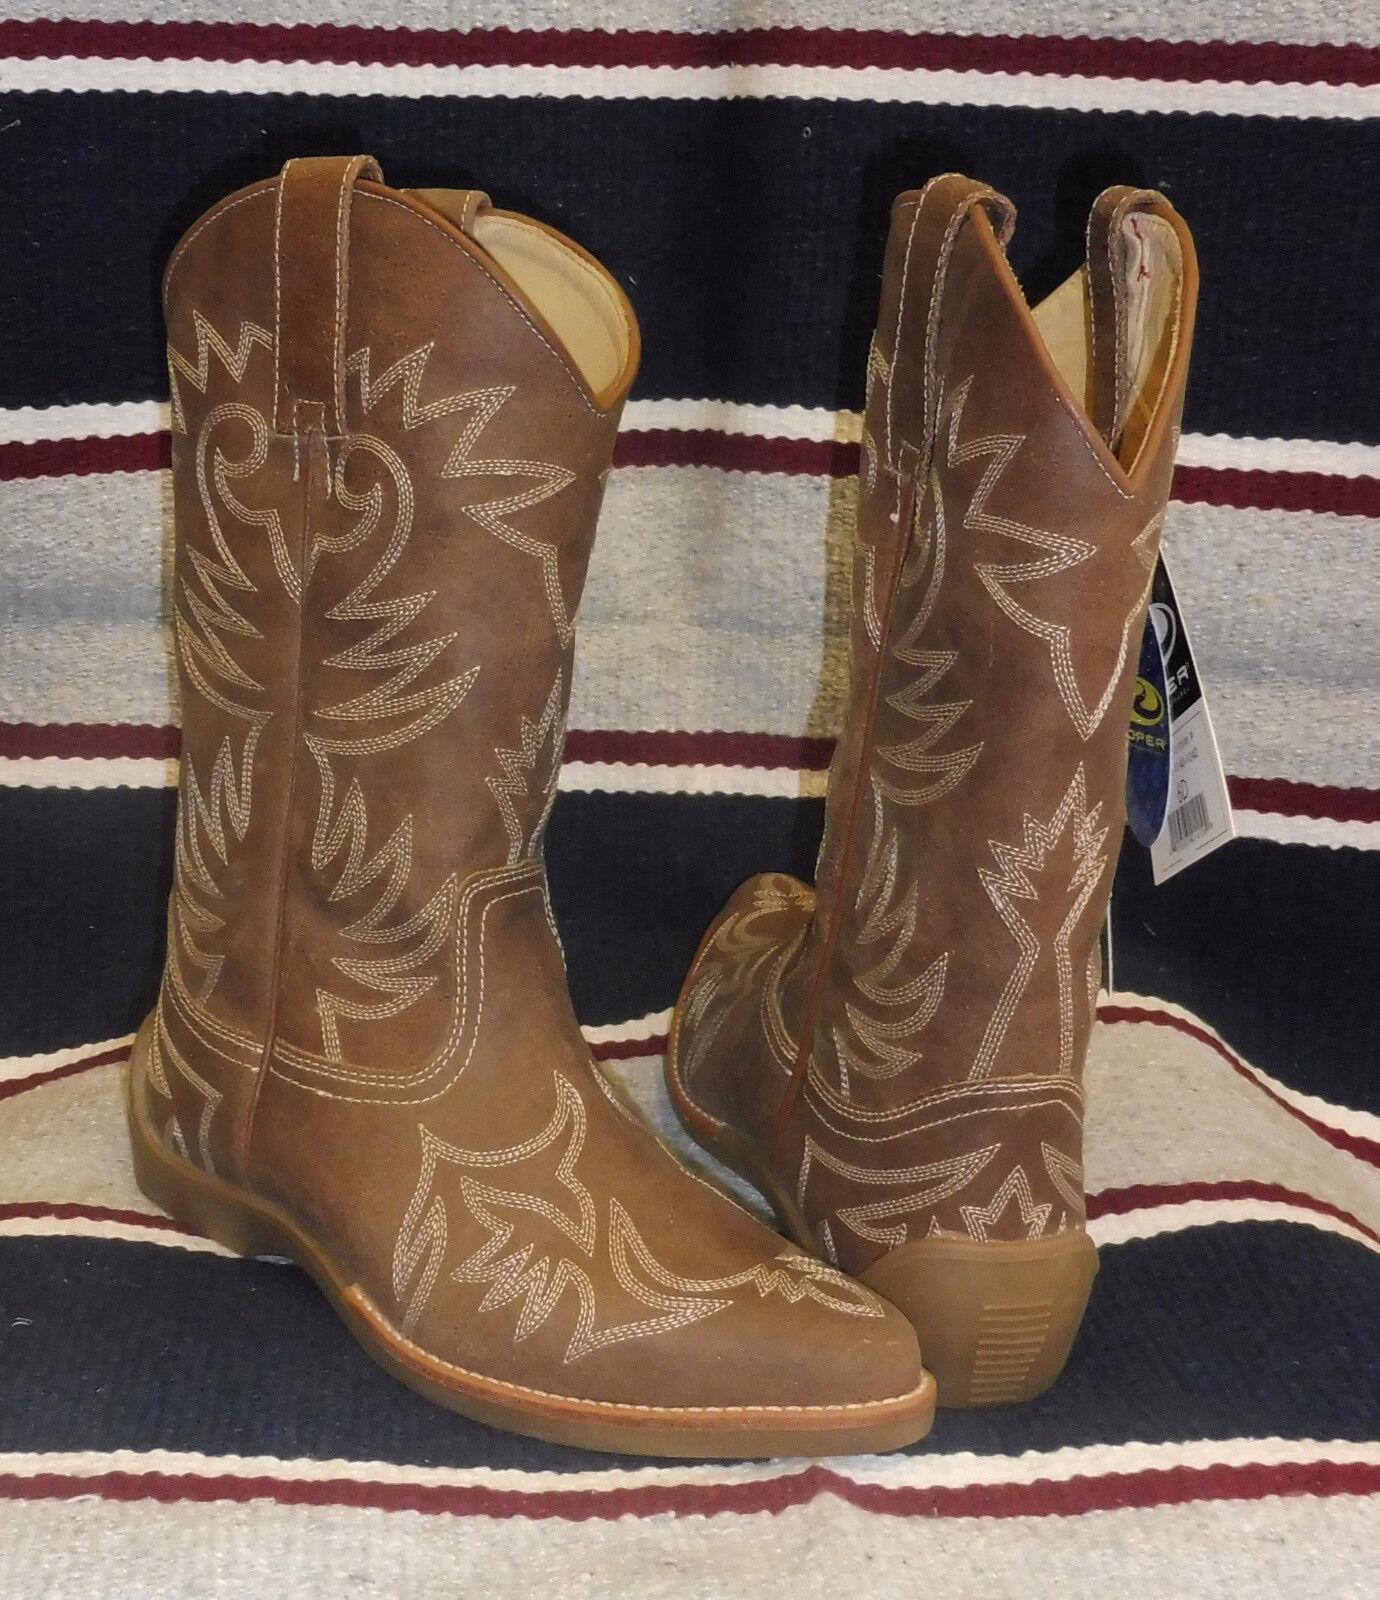 Stivali stivale texani country western cowboy donna lavoro Roper Marroneee punta